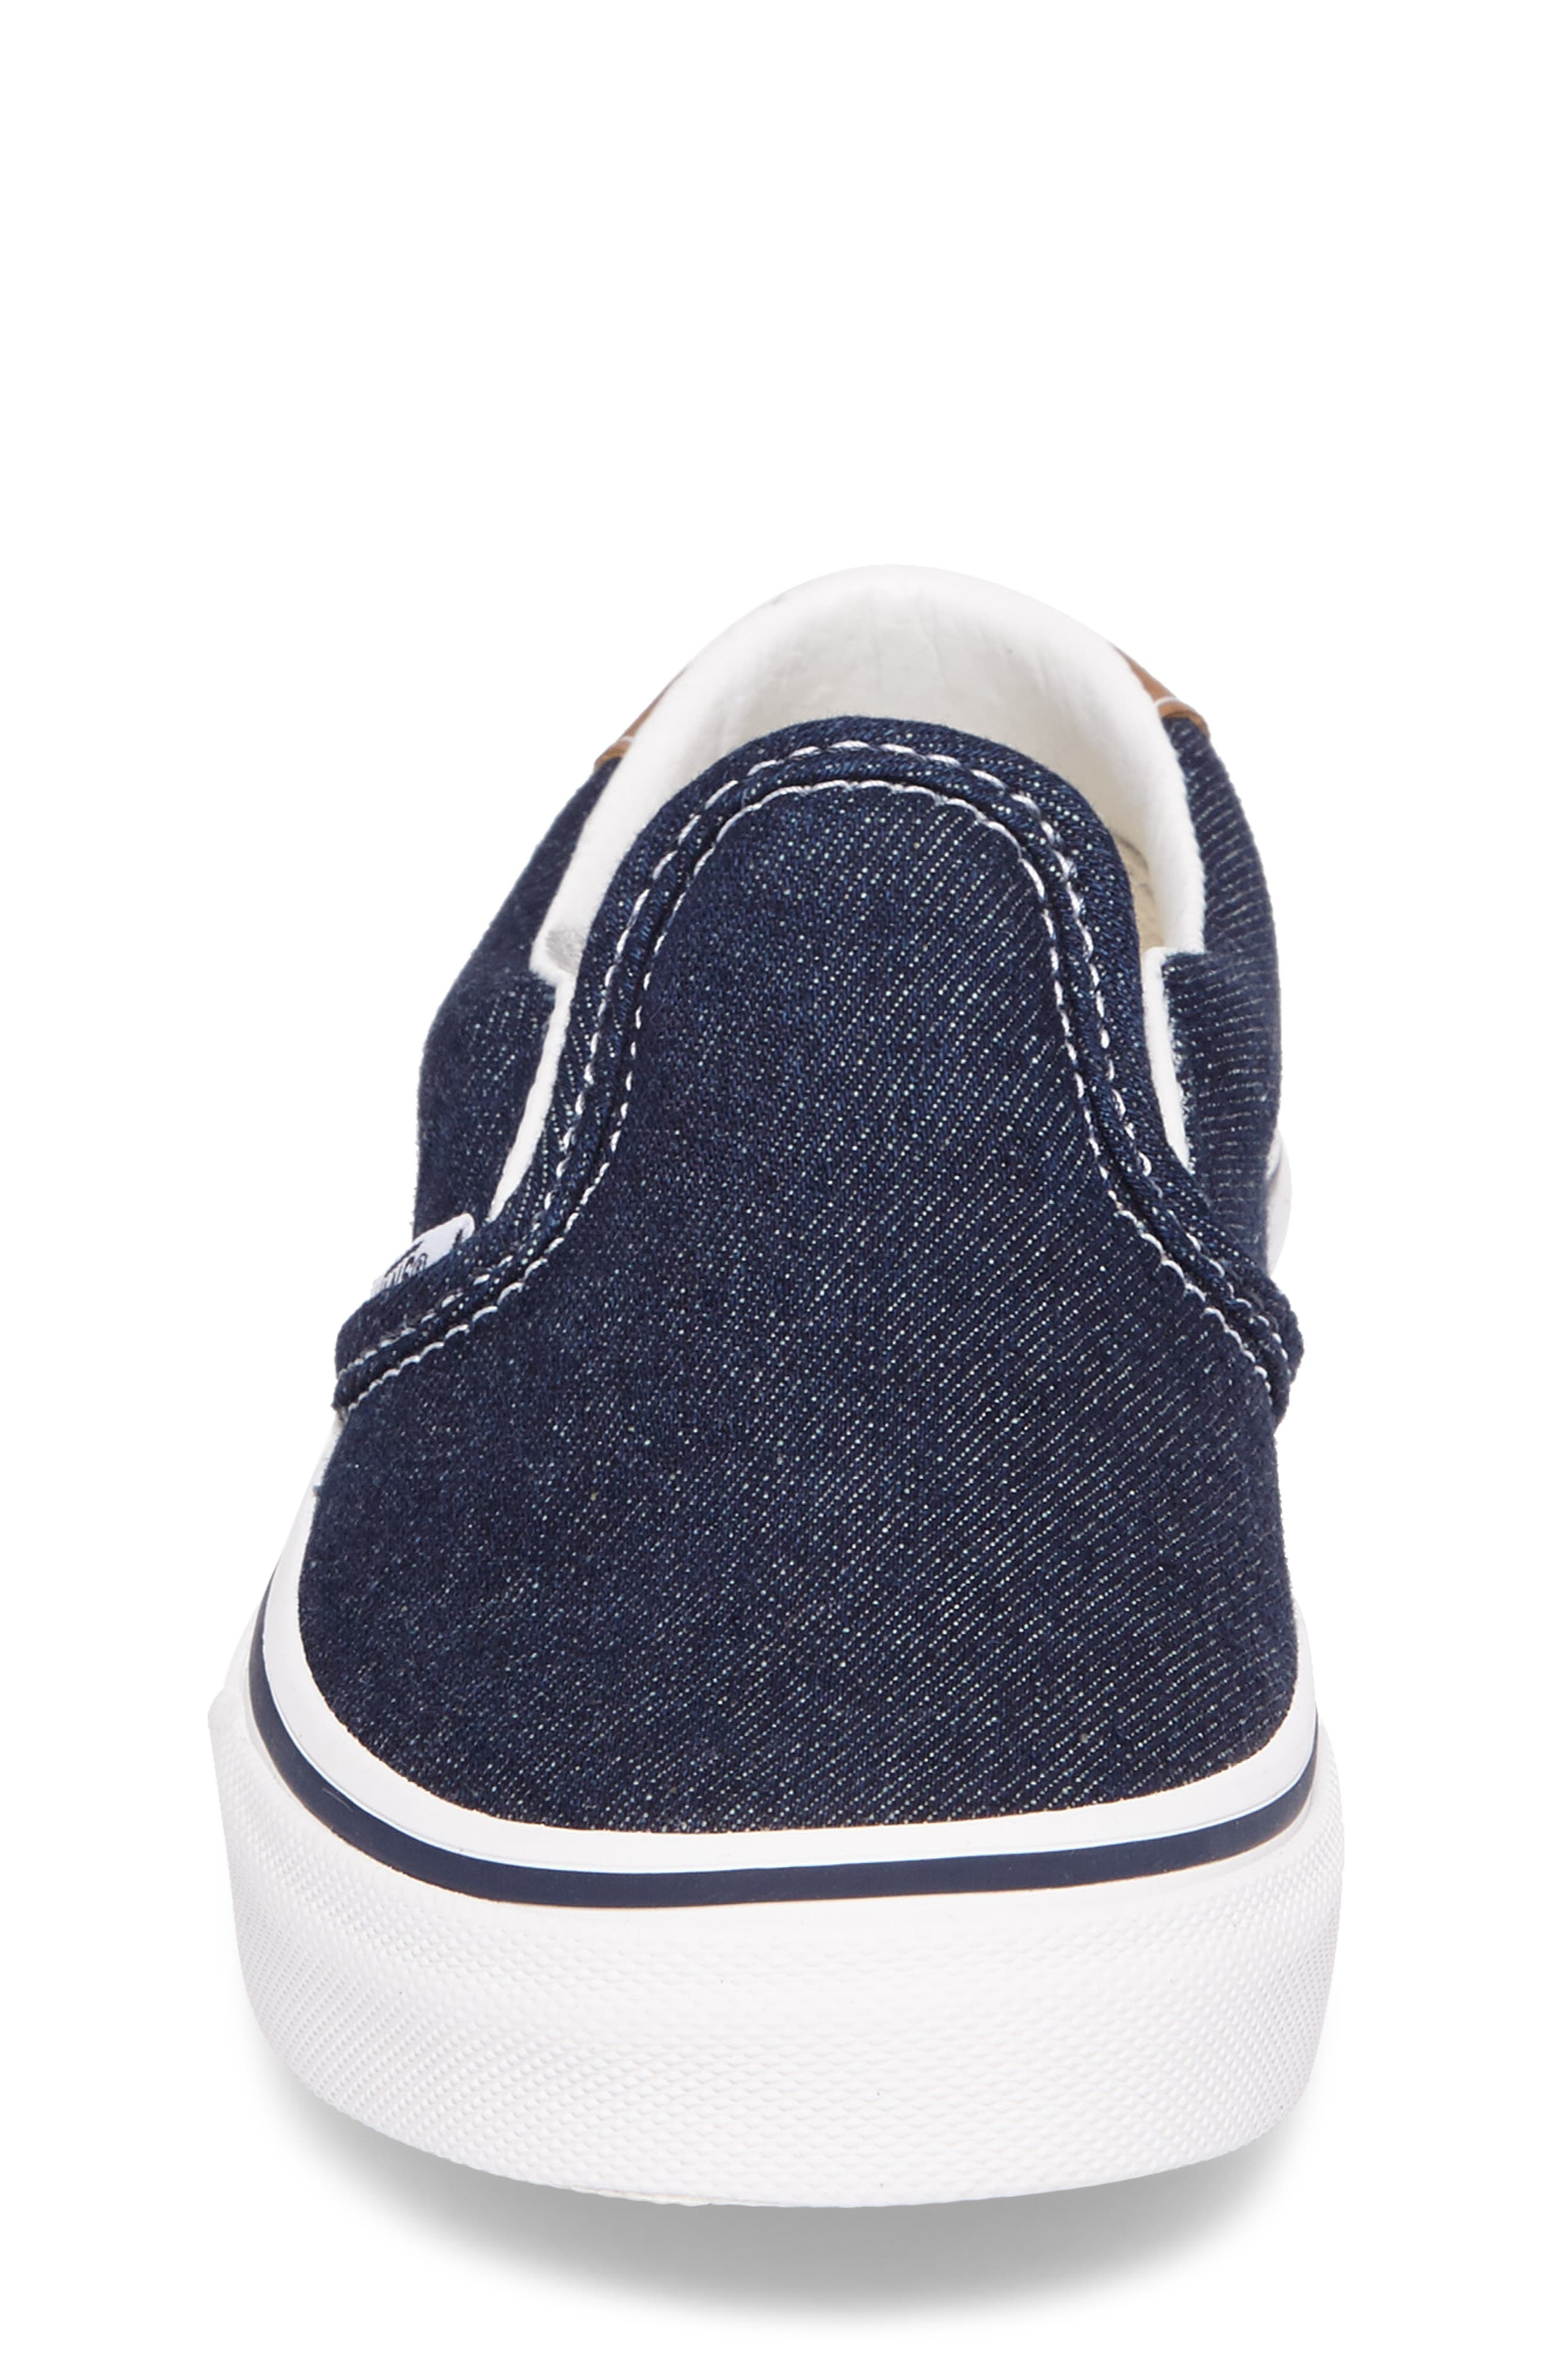 Denim C&L Slip-On 59 Sneaker,                             Alternate thumbnail 4, color,                             Denim Dress Blues/ Chipmunk